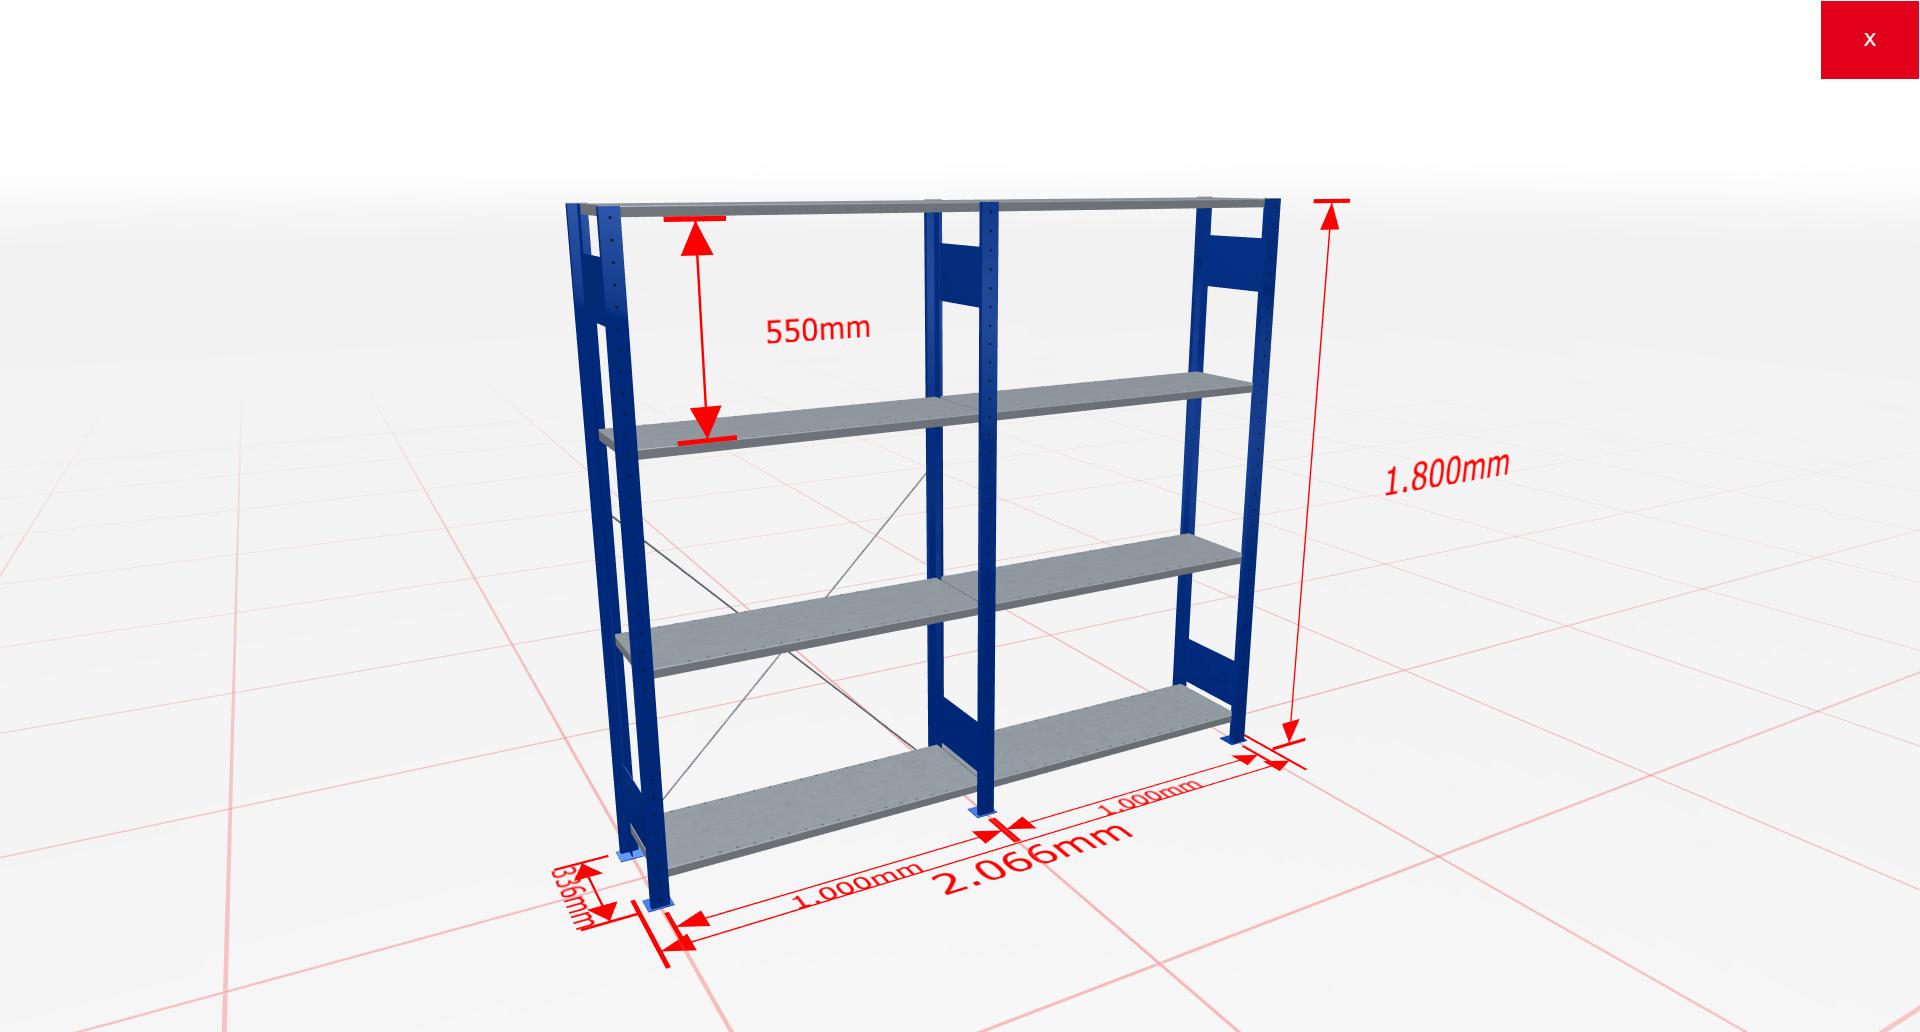 Fachbodenregal Komplettregal 1800x2066x300 mm (HxBxT) SCHULTE Lagertechnik blau 4 Ebenen  150 kg je Boden